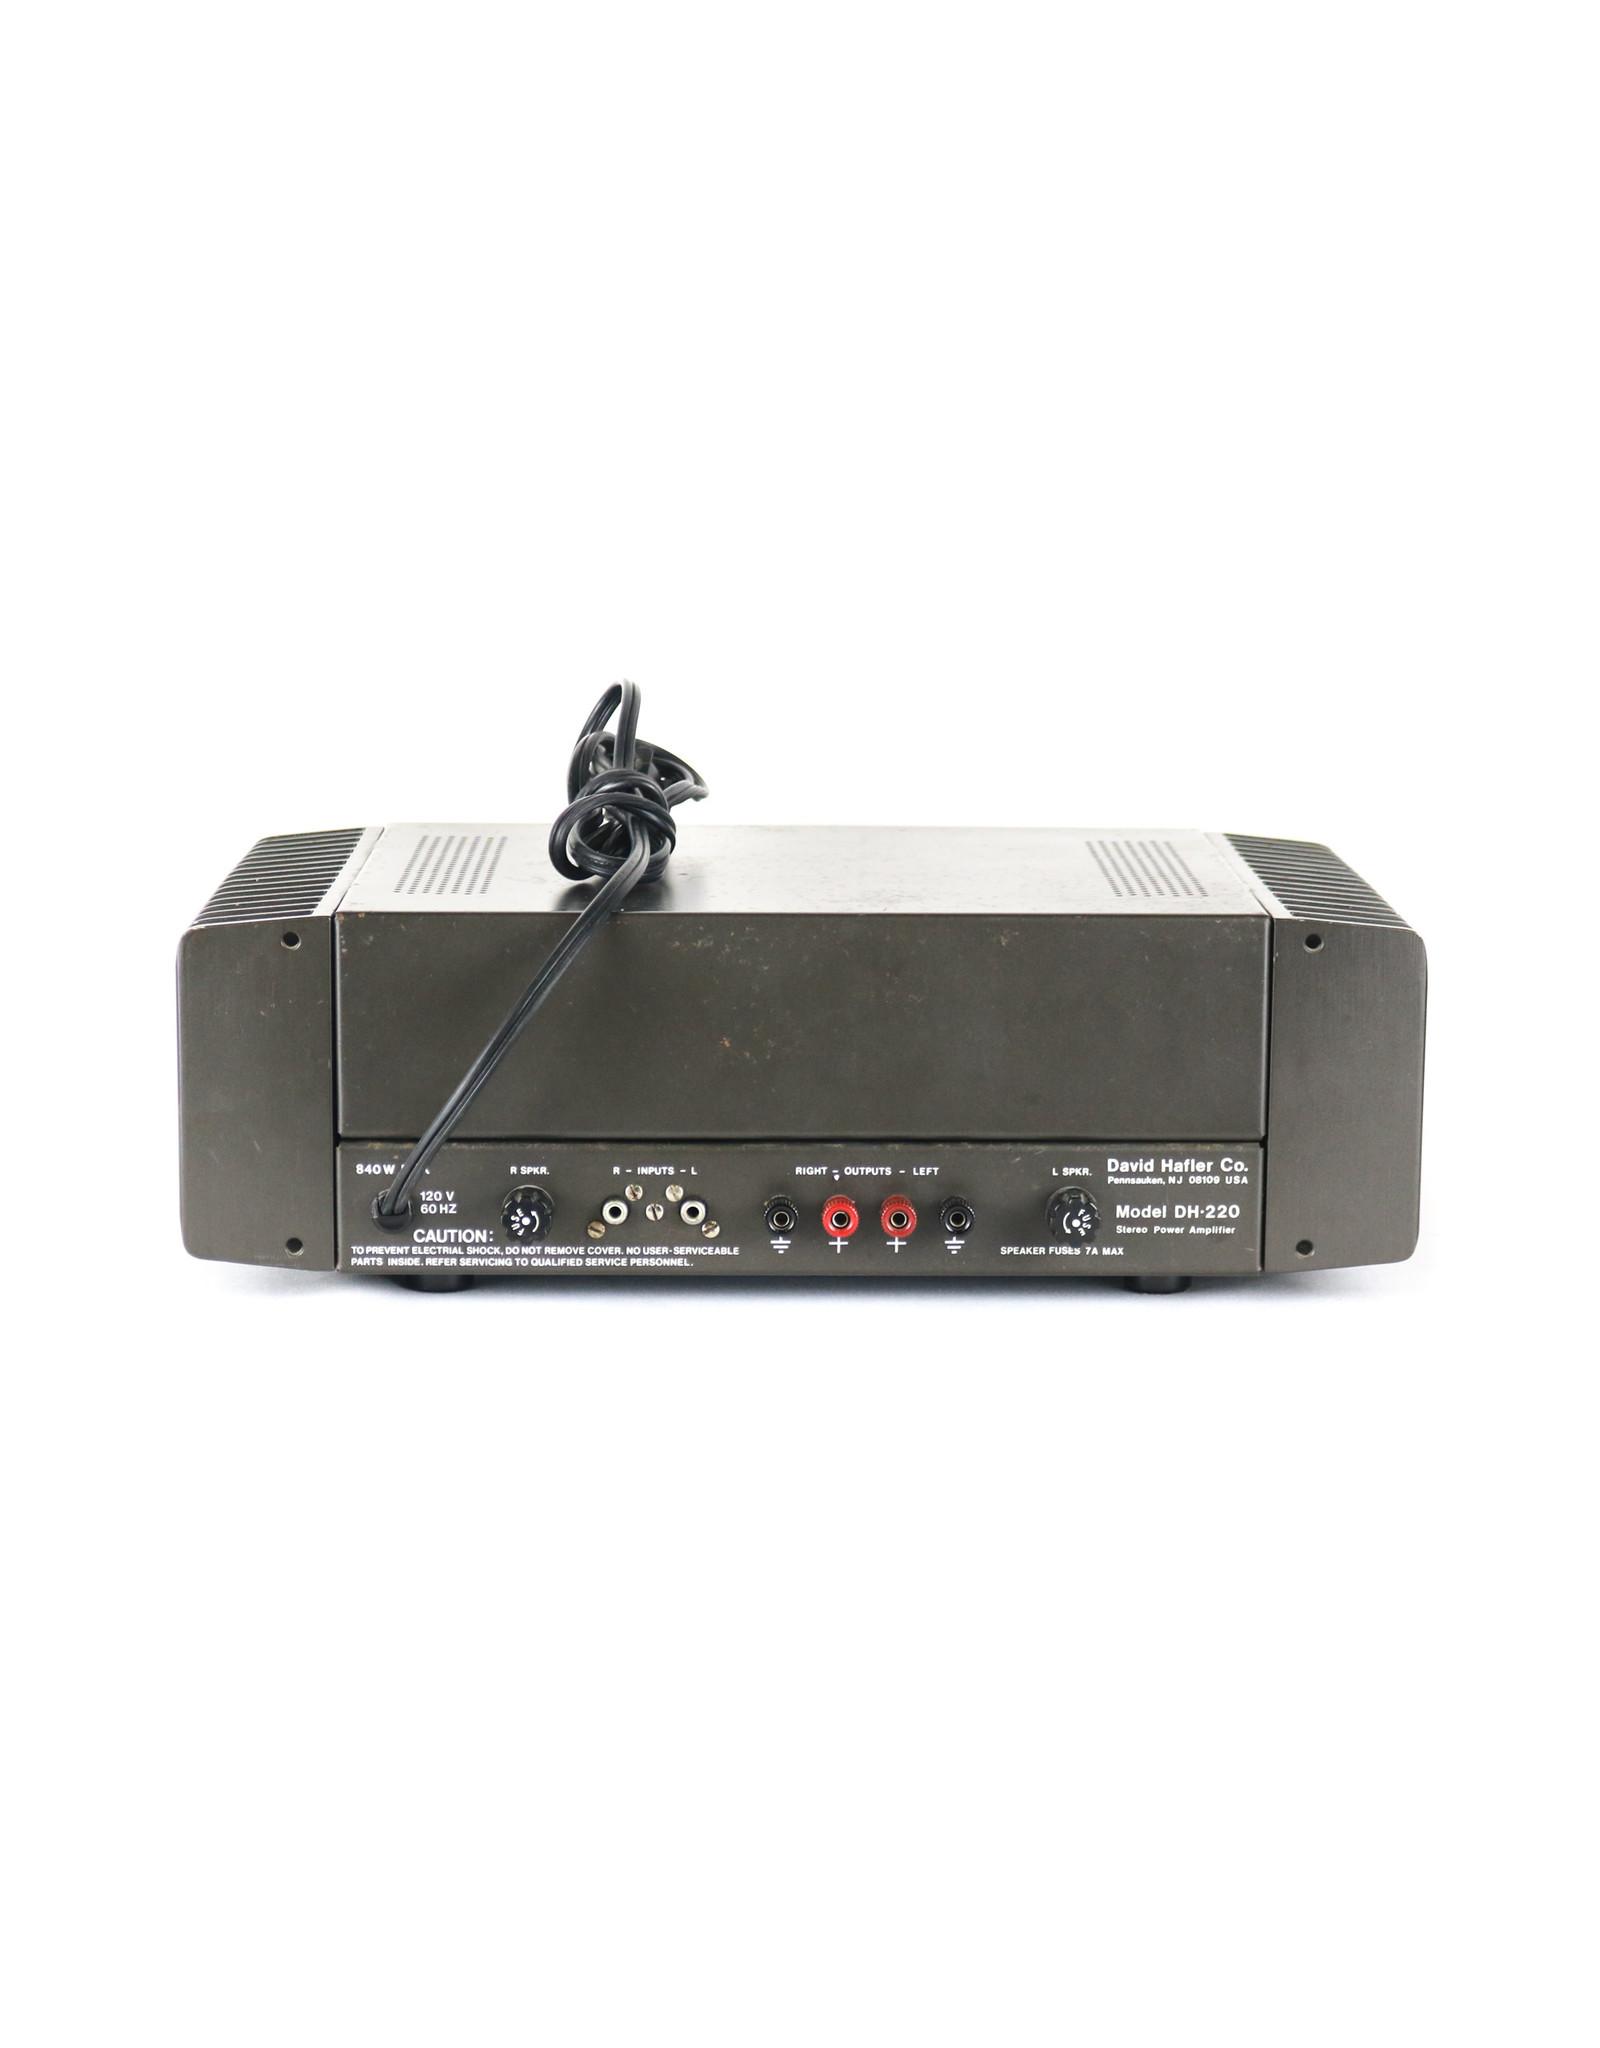 Hafler Hafler DH-220 Power Amp USED